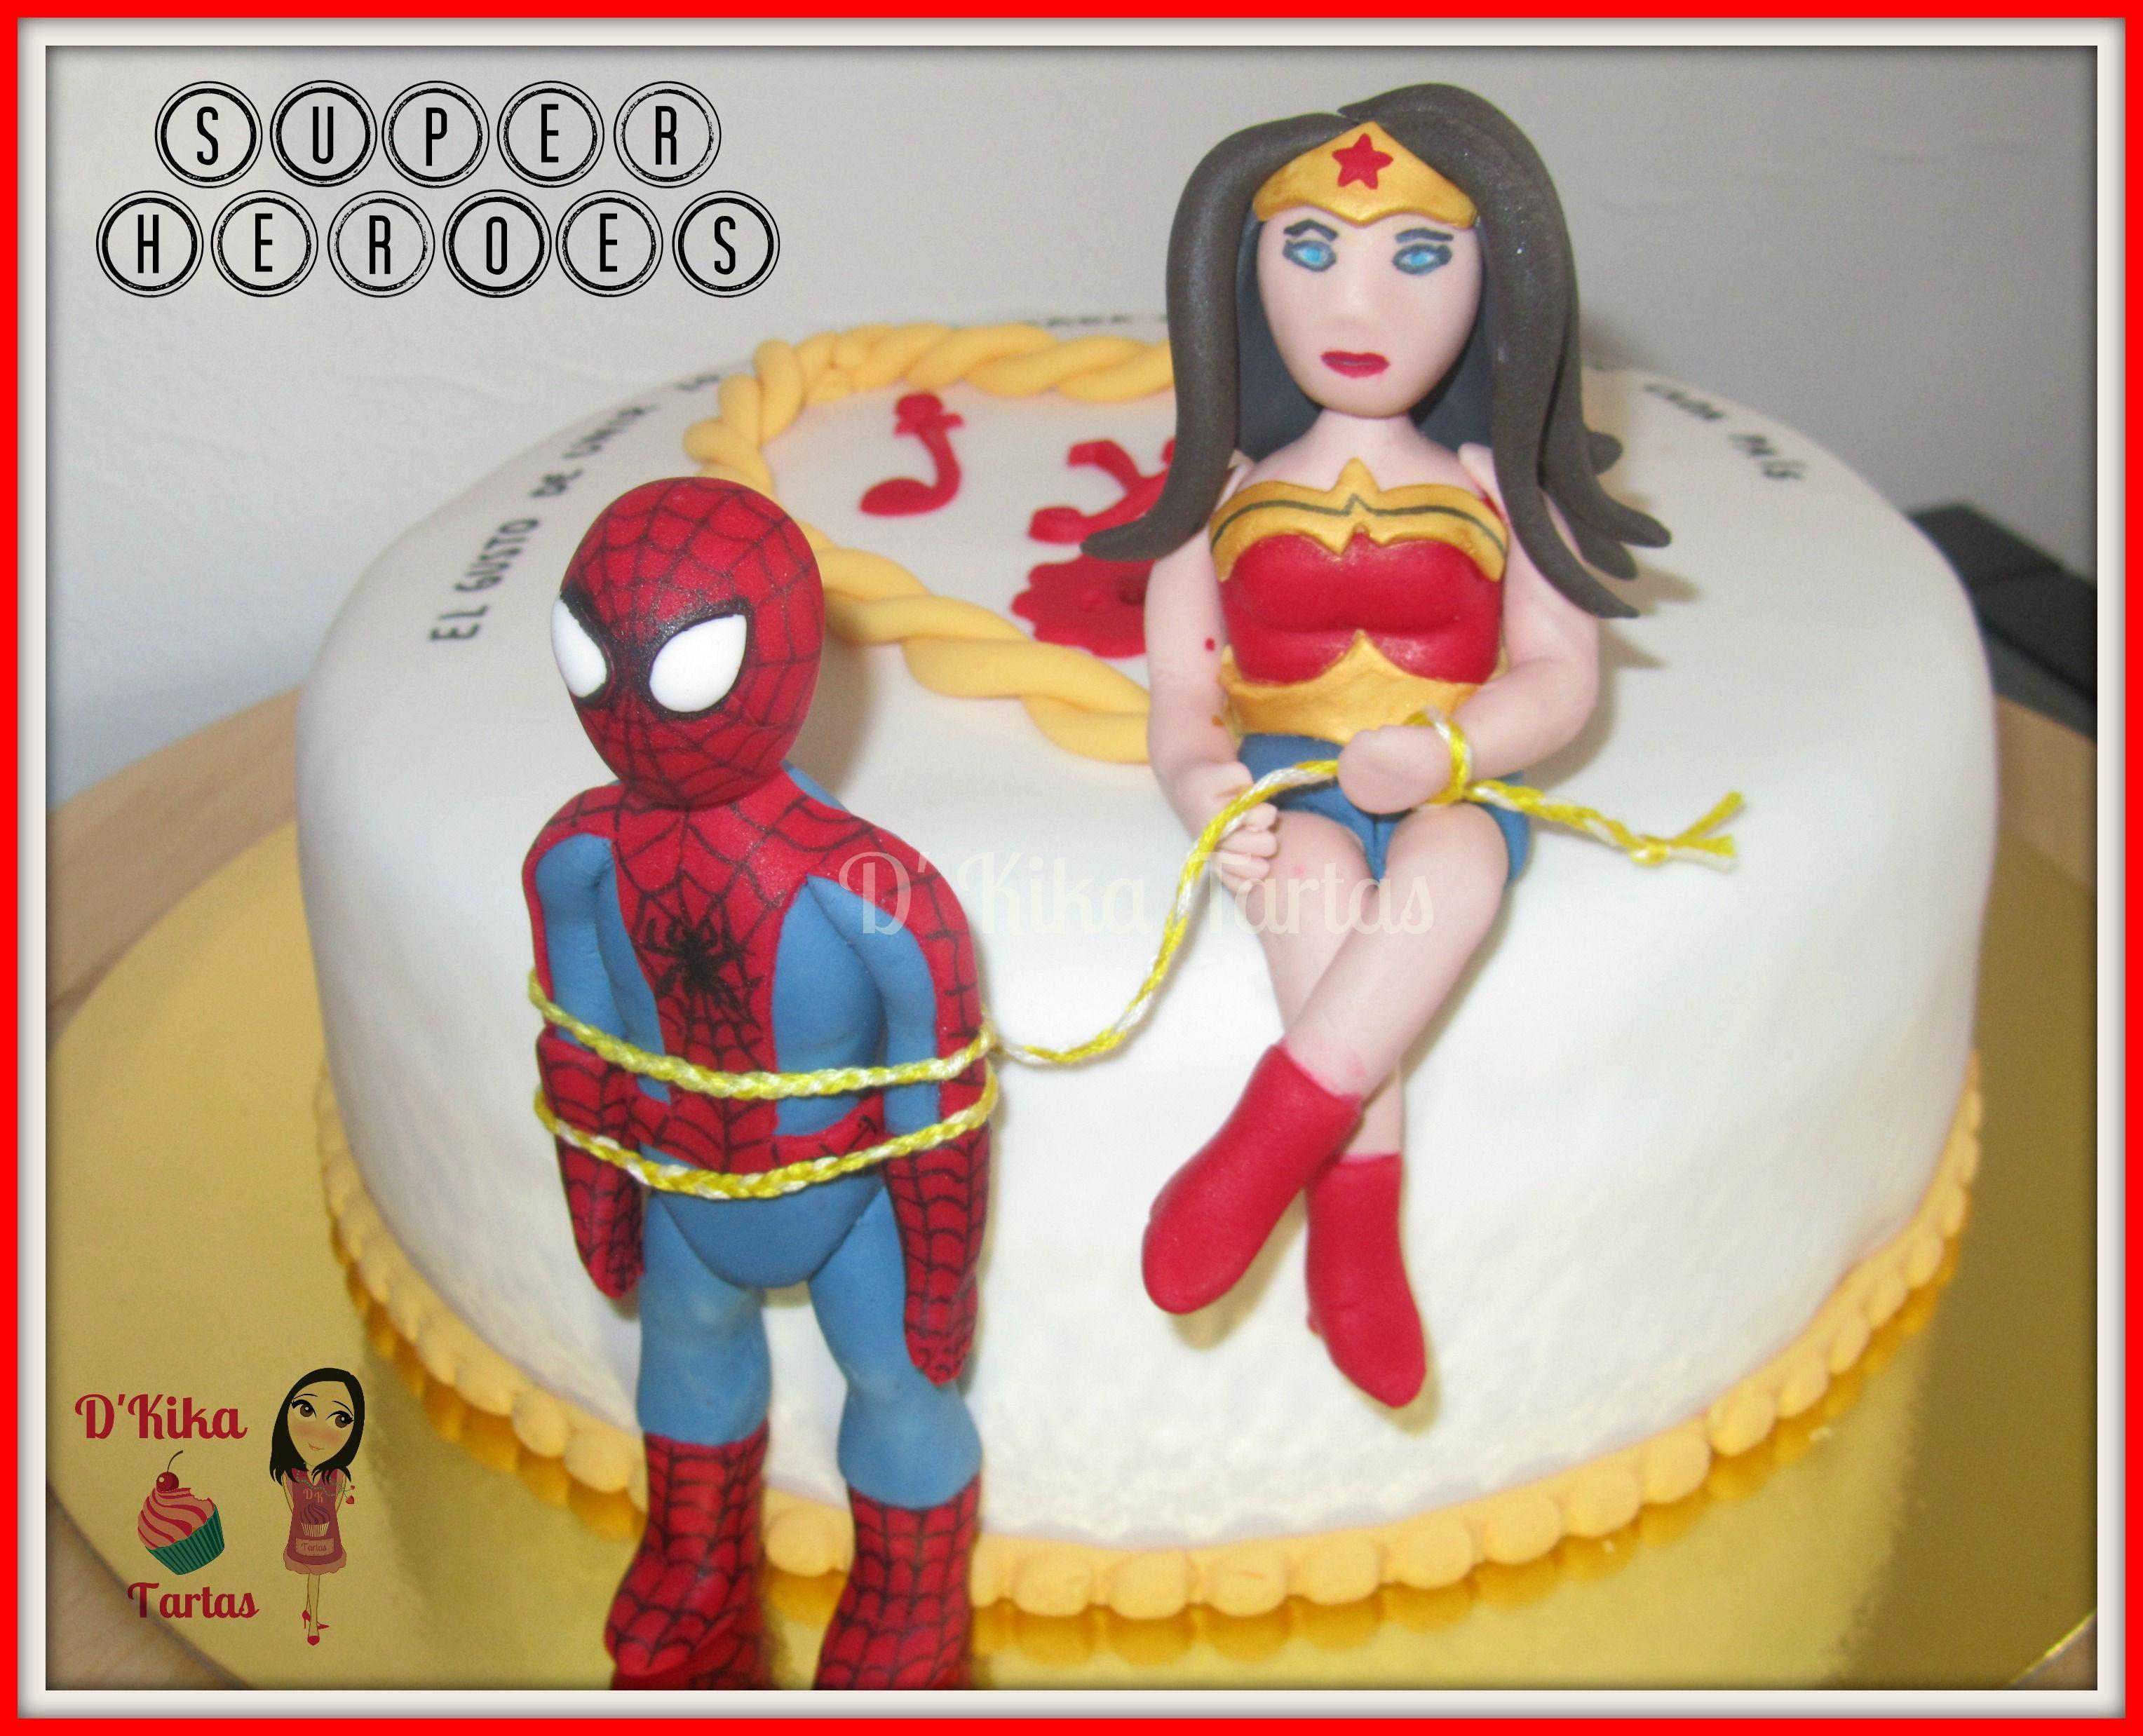 Tarta hombre ara a y mujer maravilla spiderman and wonder woman cake